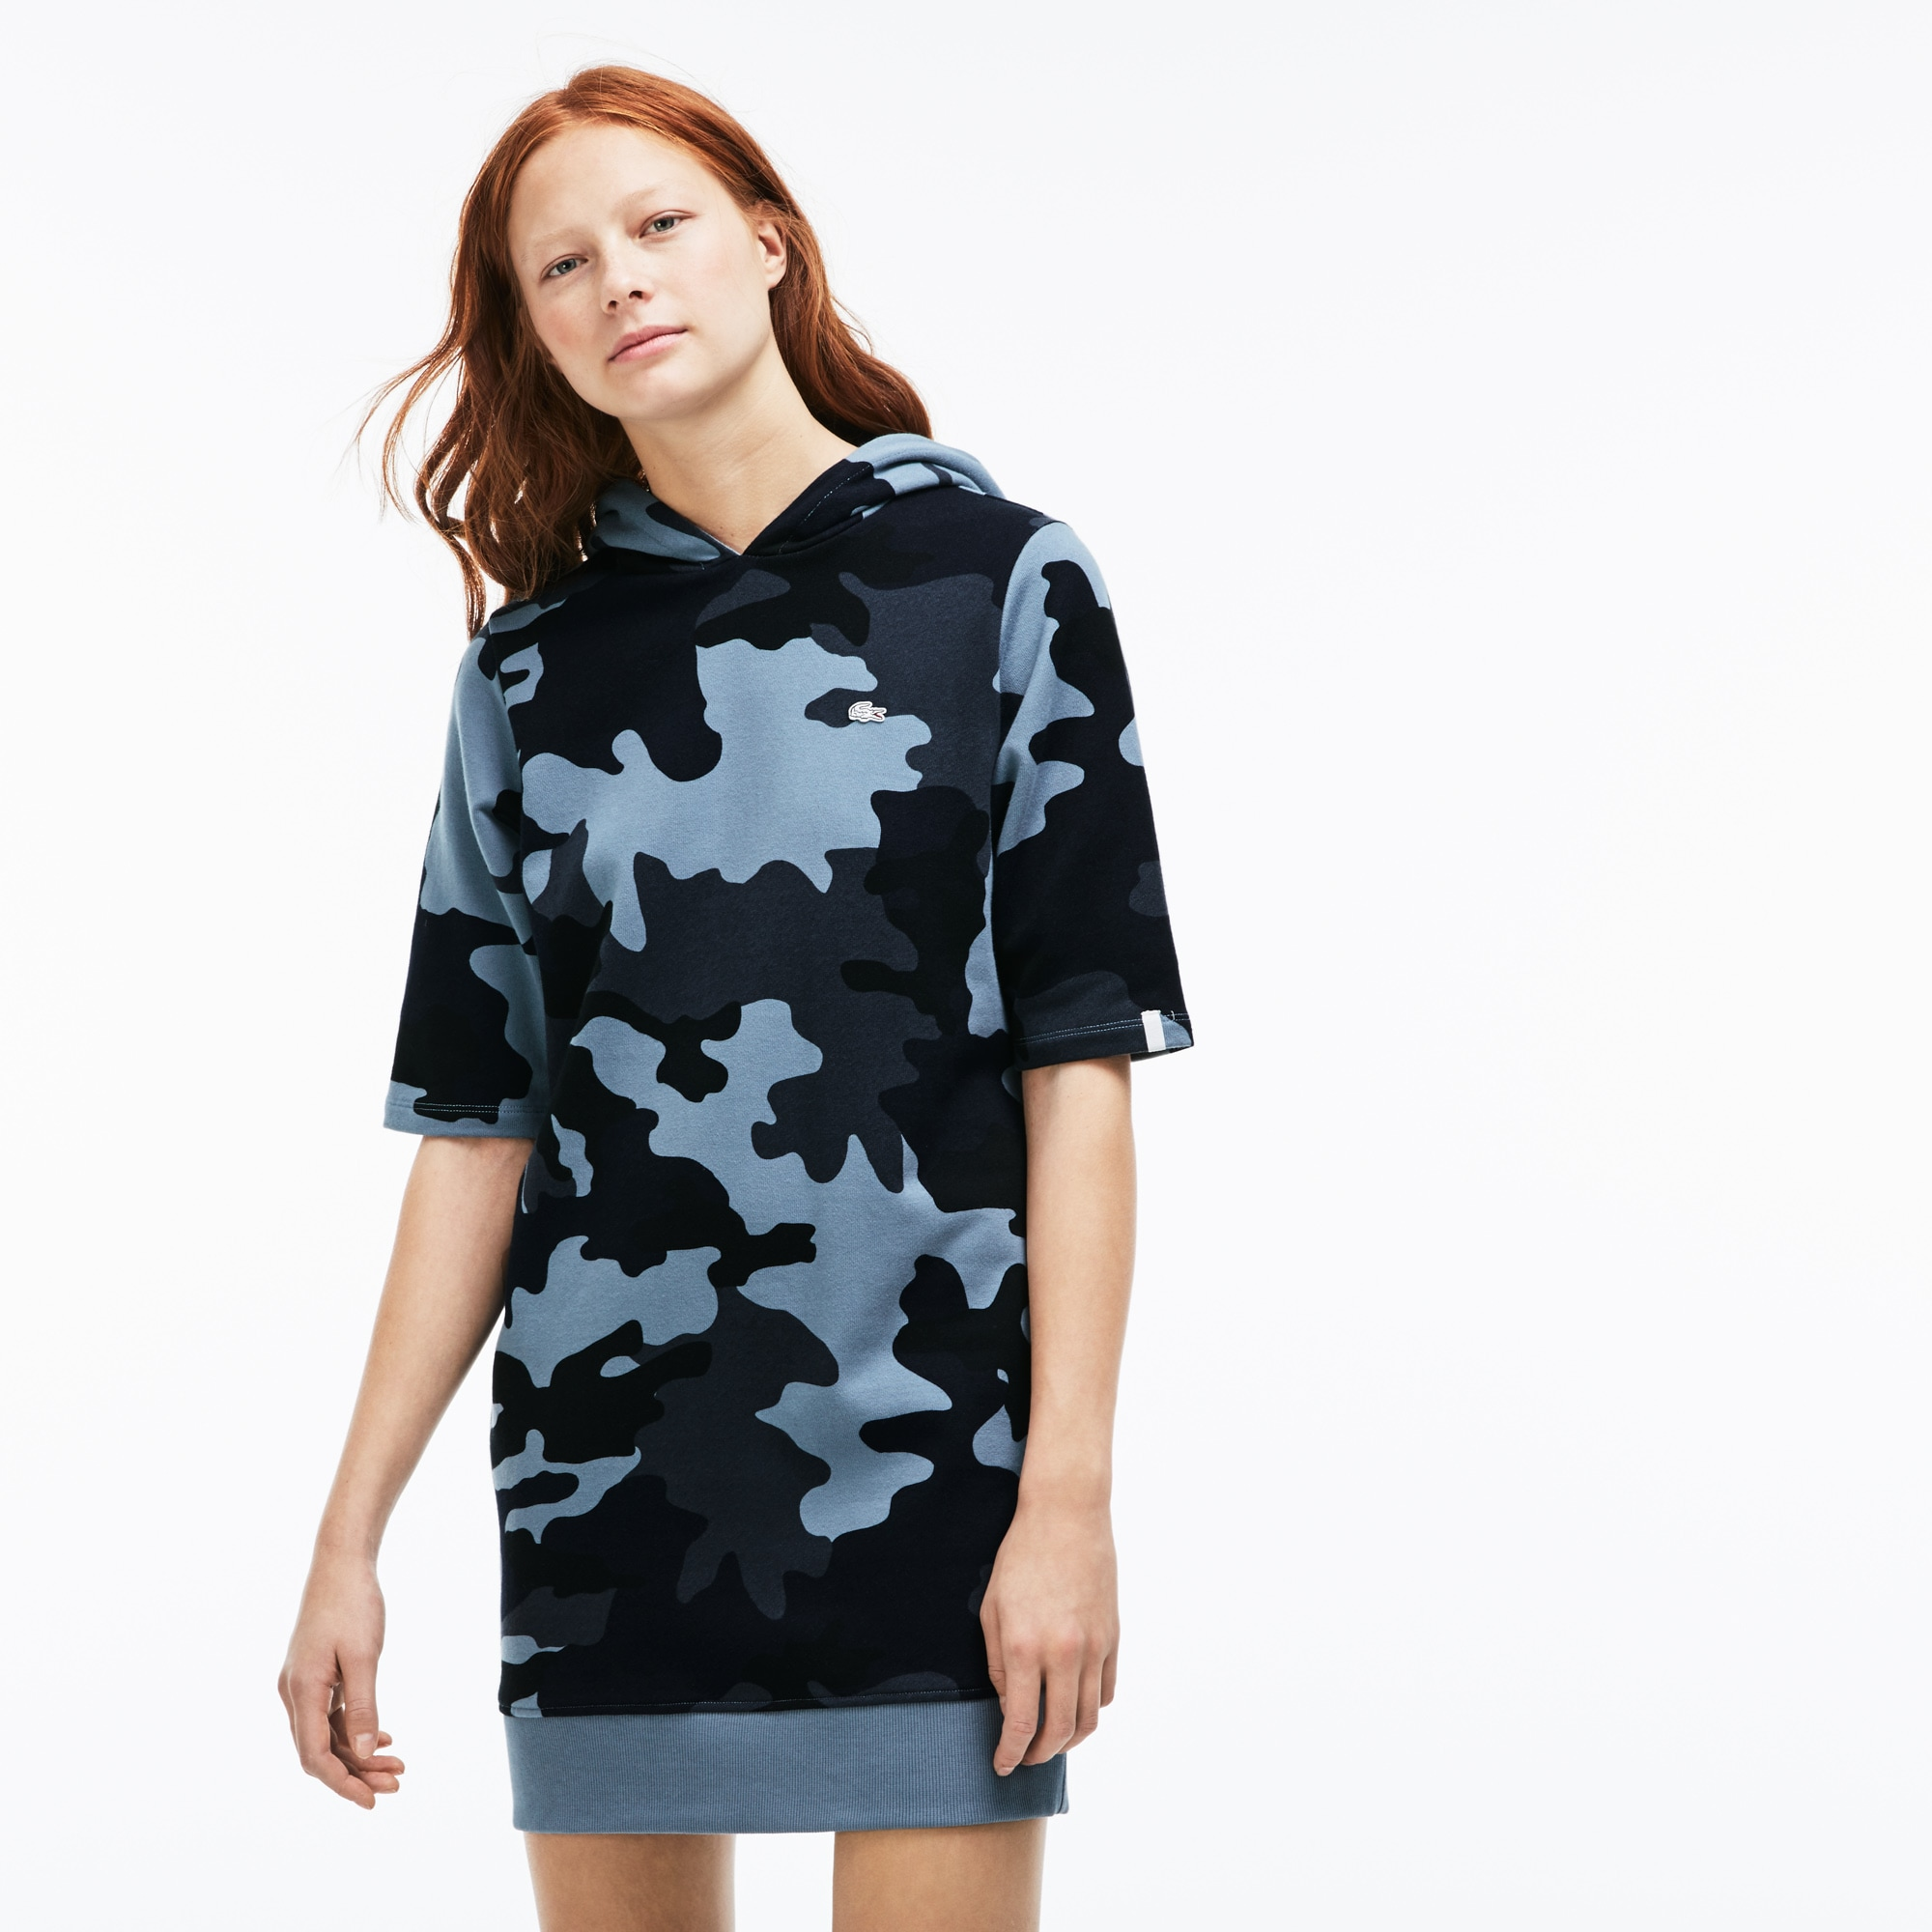 Women's LIVE Camouflage Sweatshirt Dress